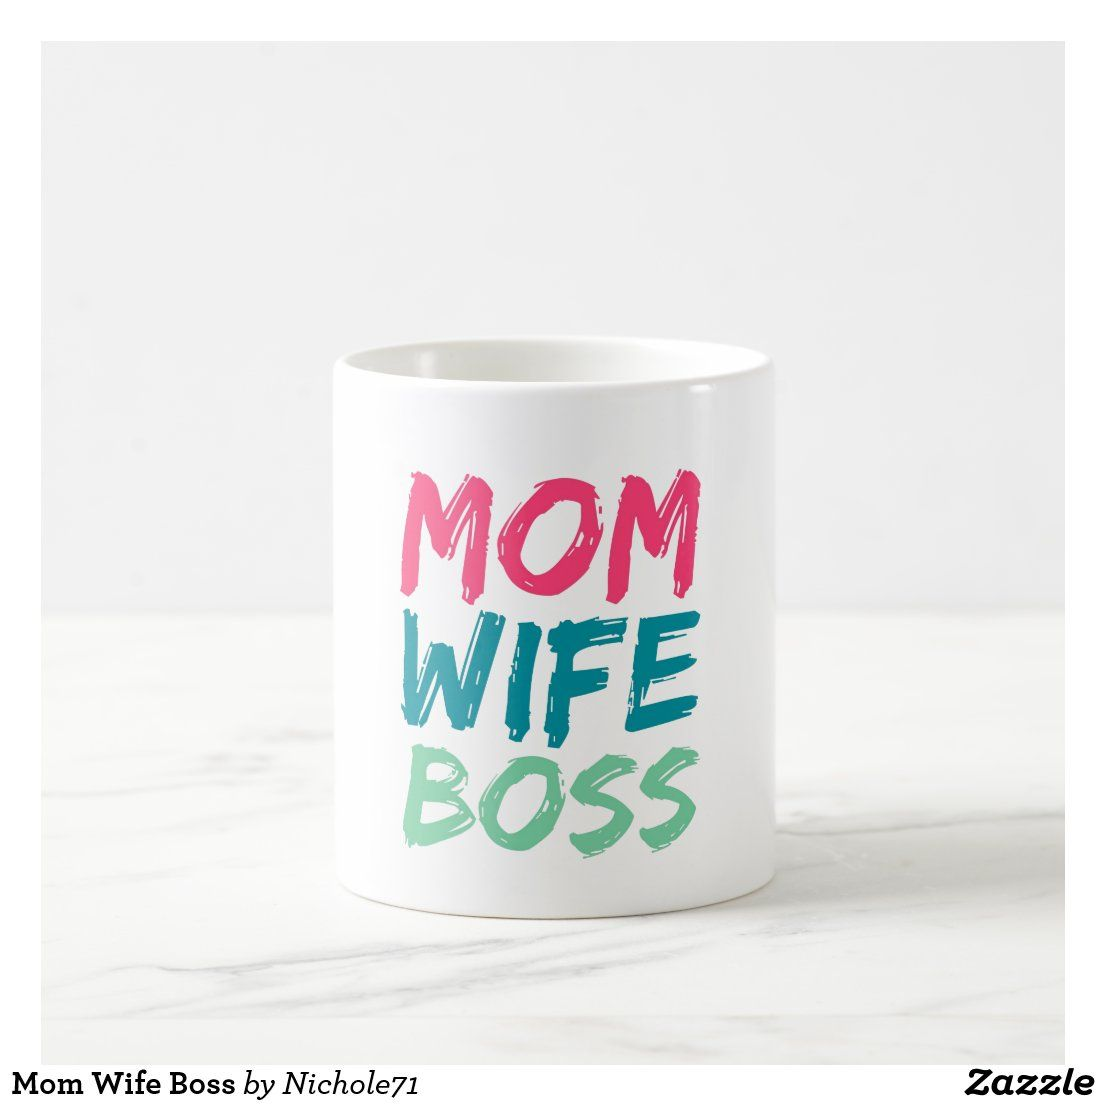 Mom Wife Boss Coffee Mug | Zazzle.com